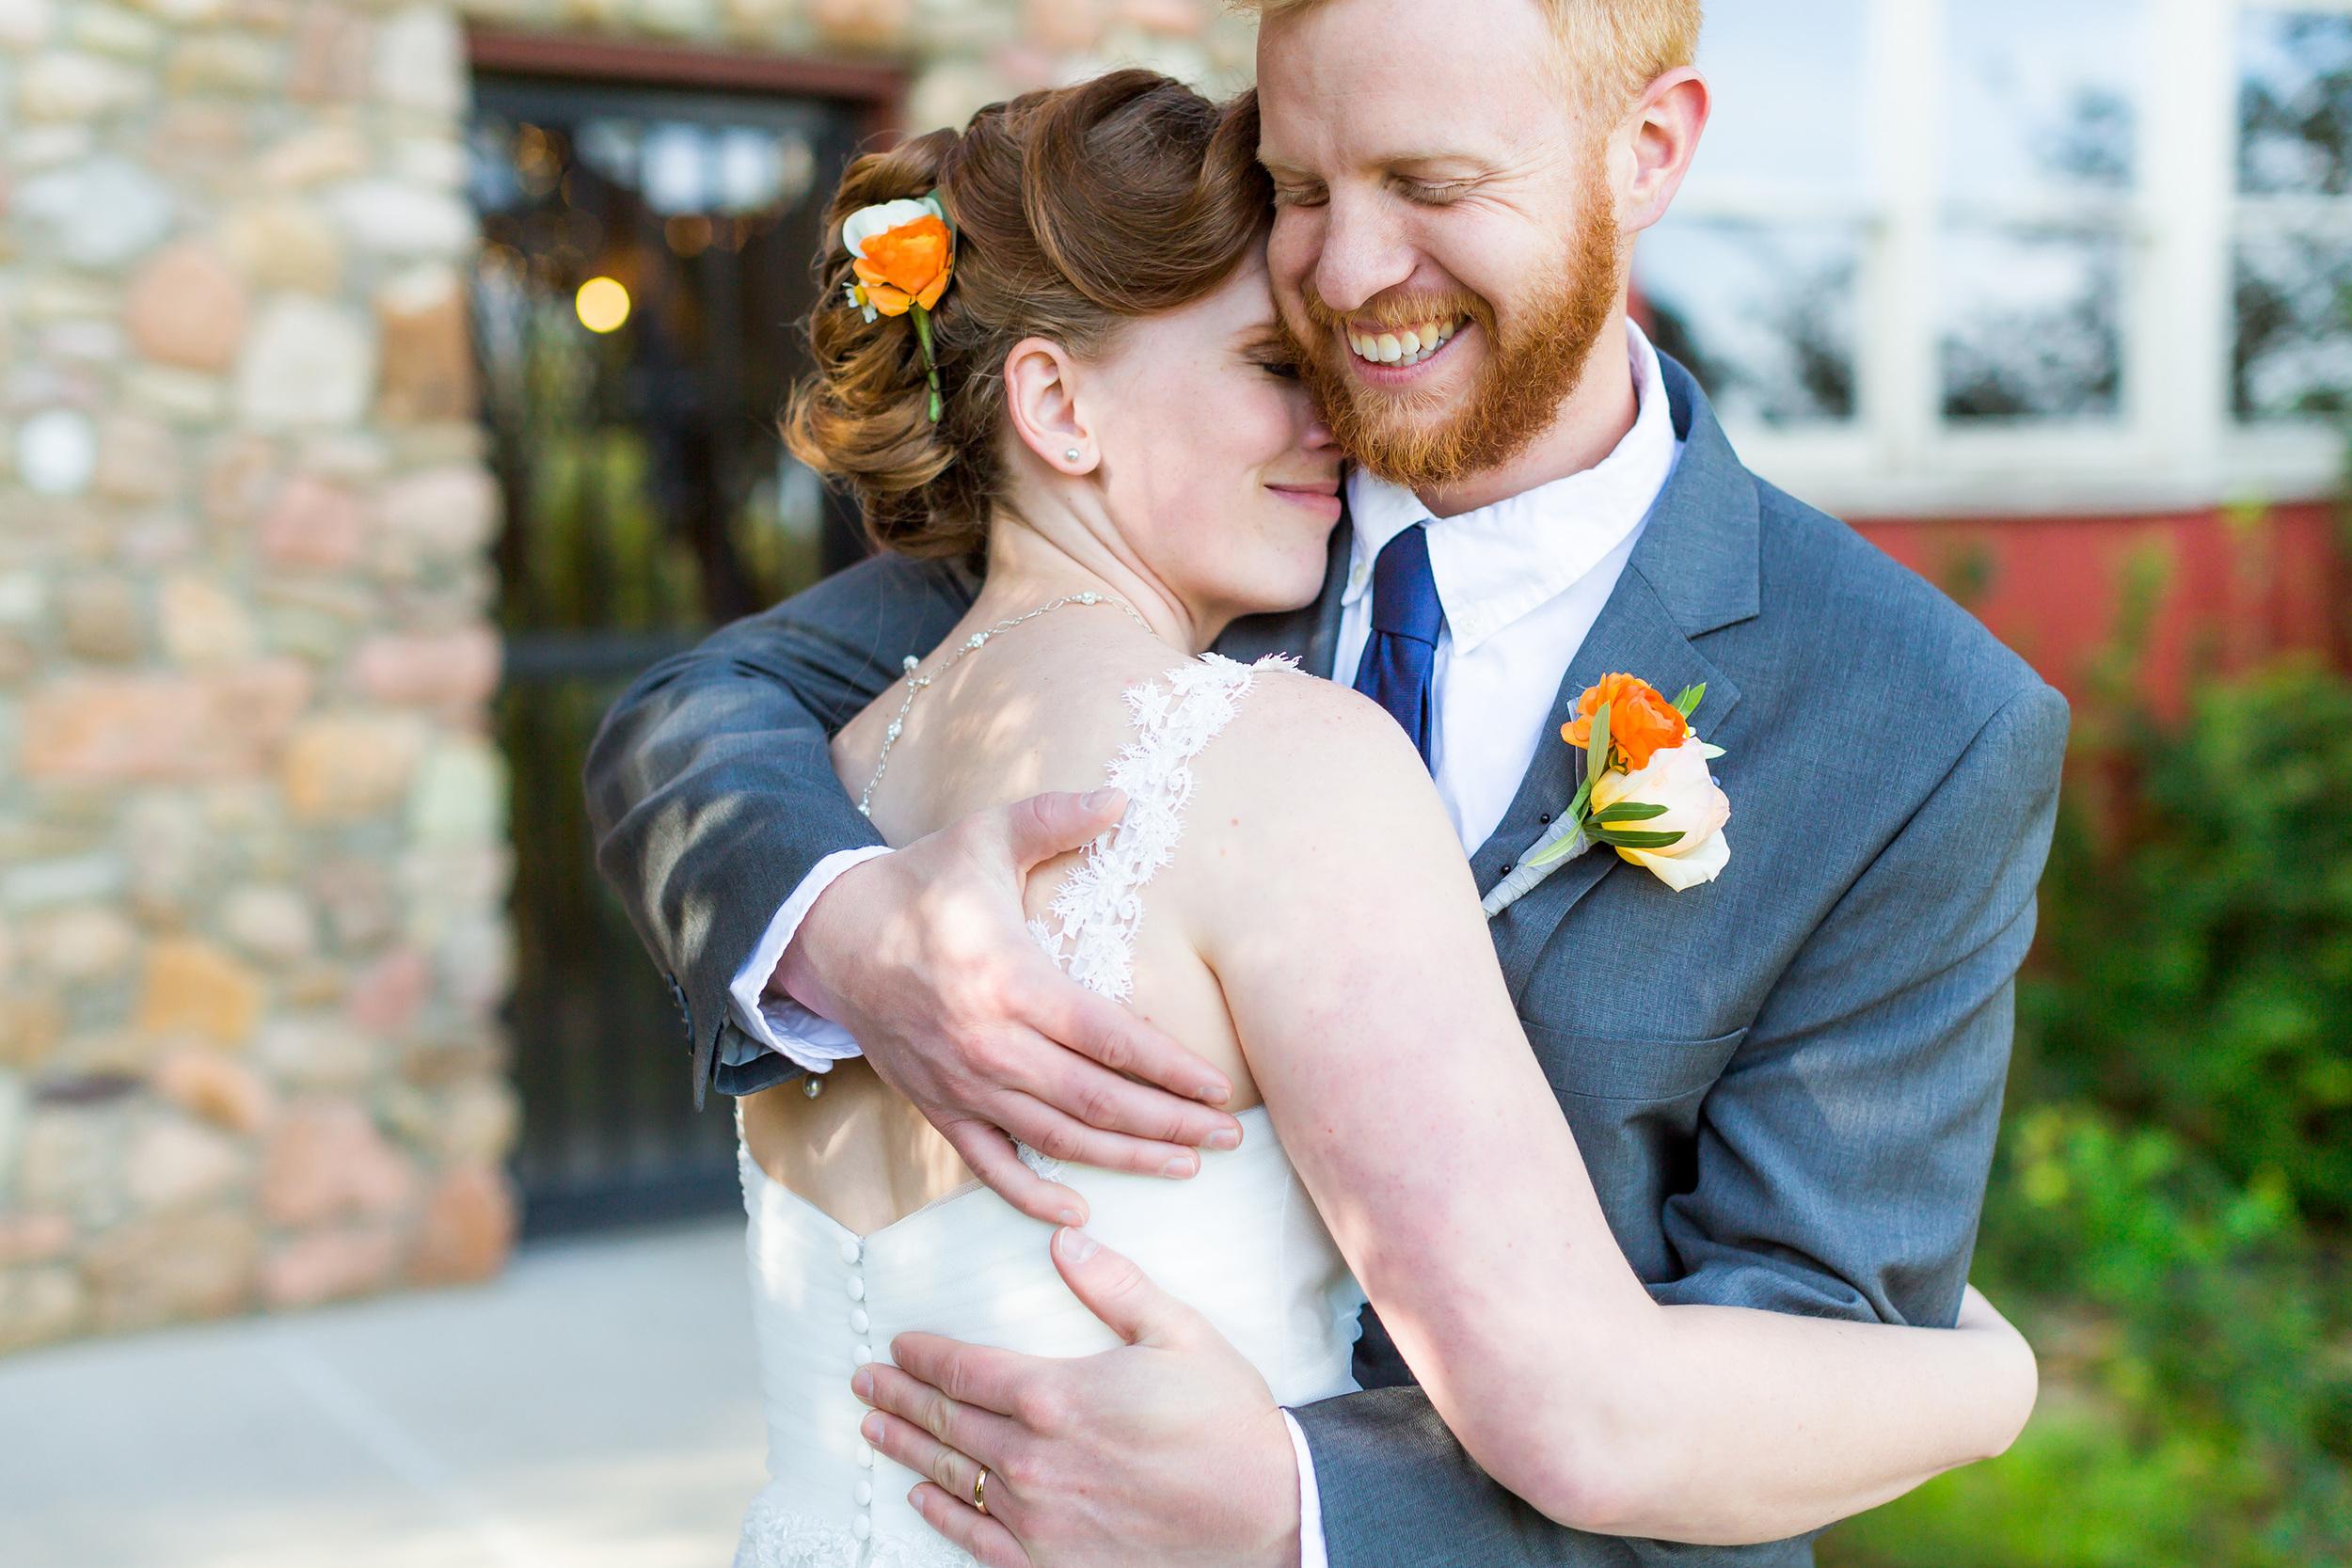 Longmont Wedding Photography By: Ashley McKenzie